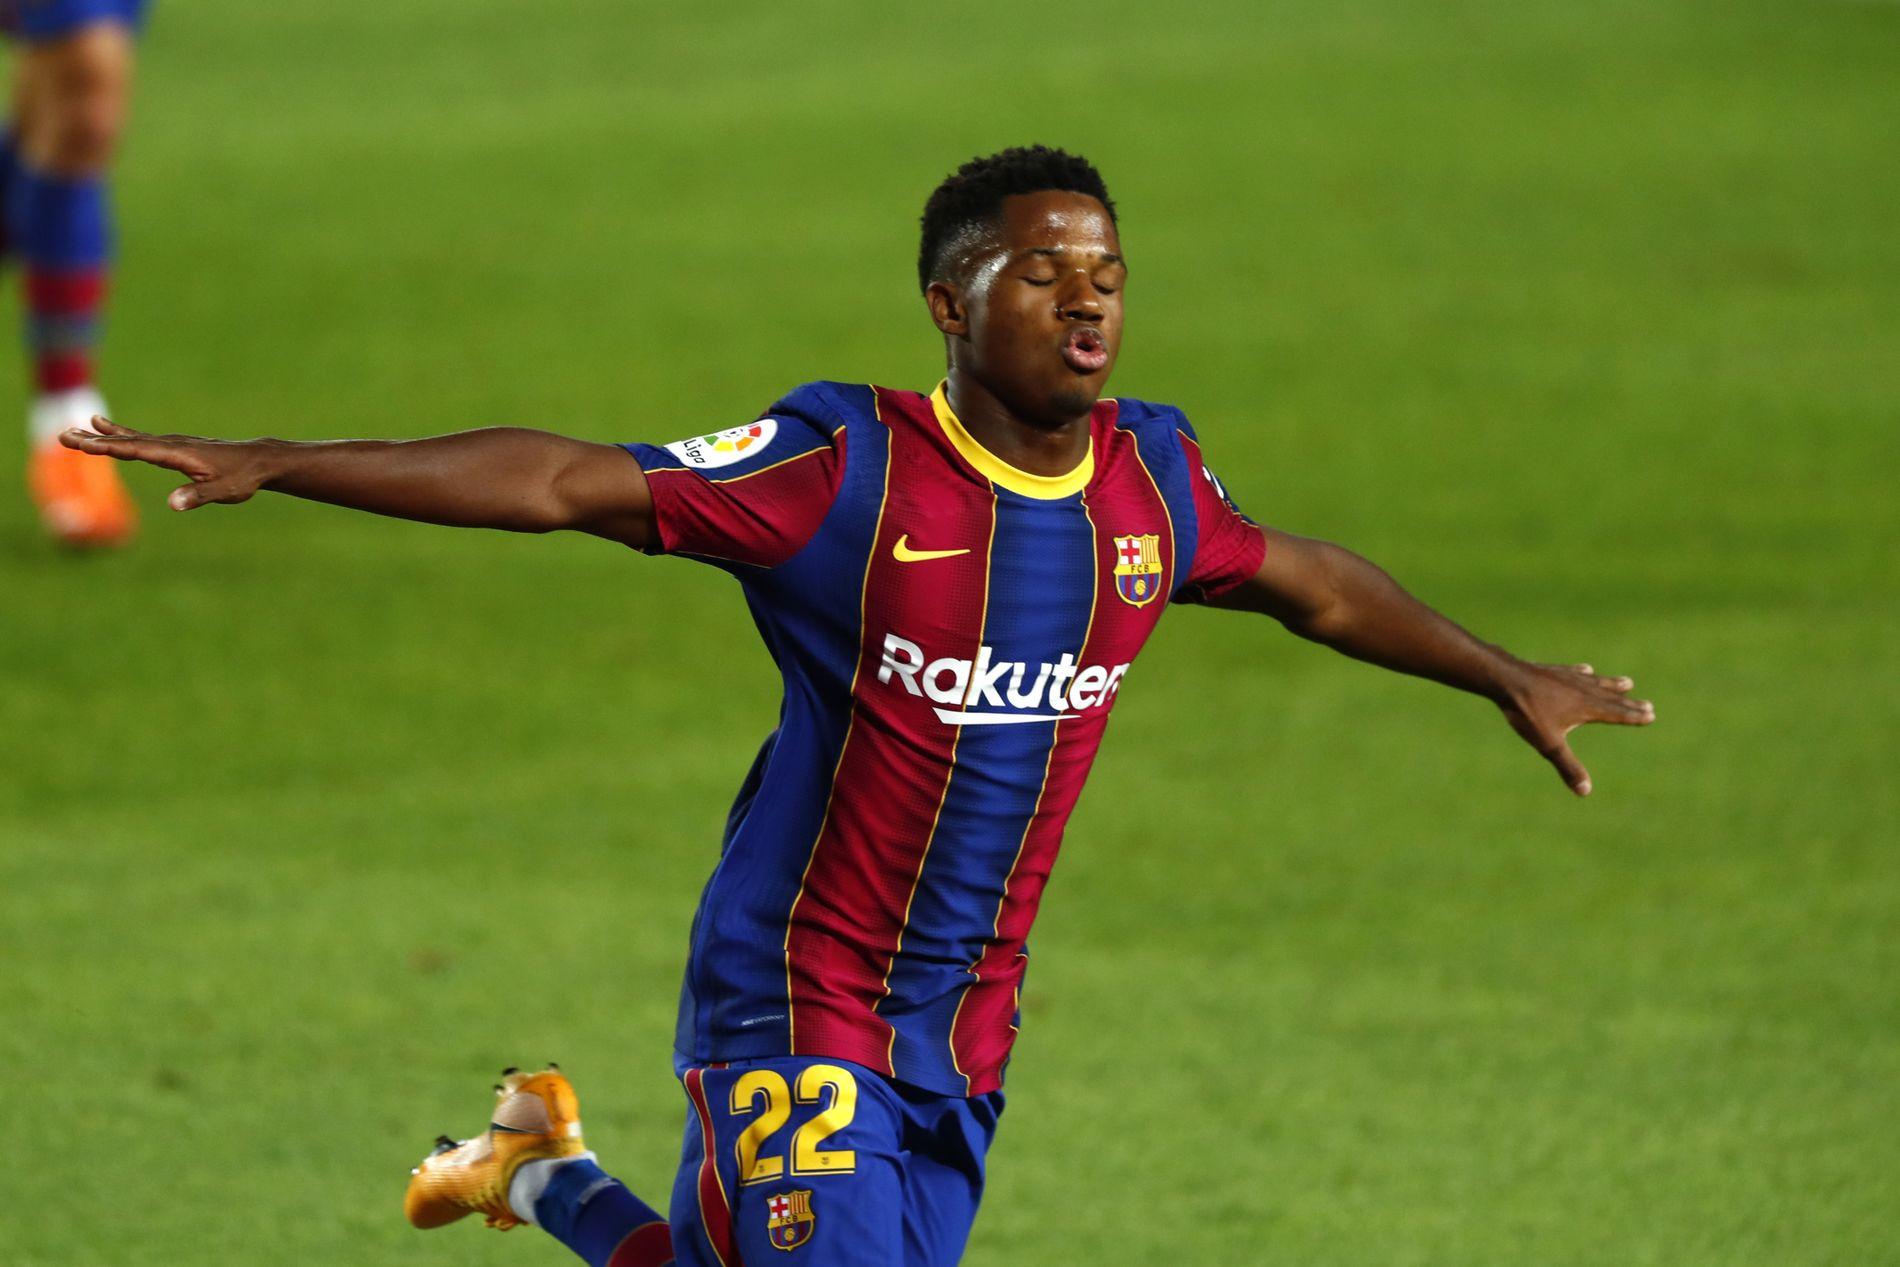 Messi scoret i første kamp etter bråket, men Ansu Fati (17) stjal showet –  VG